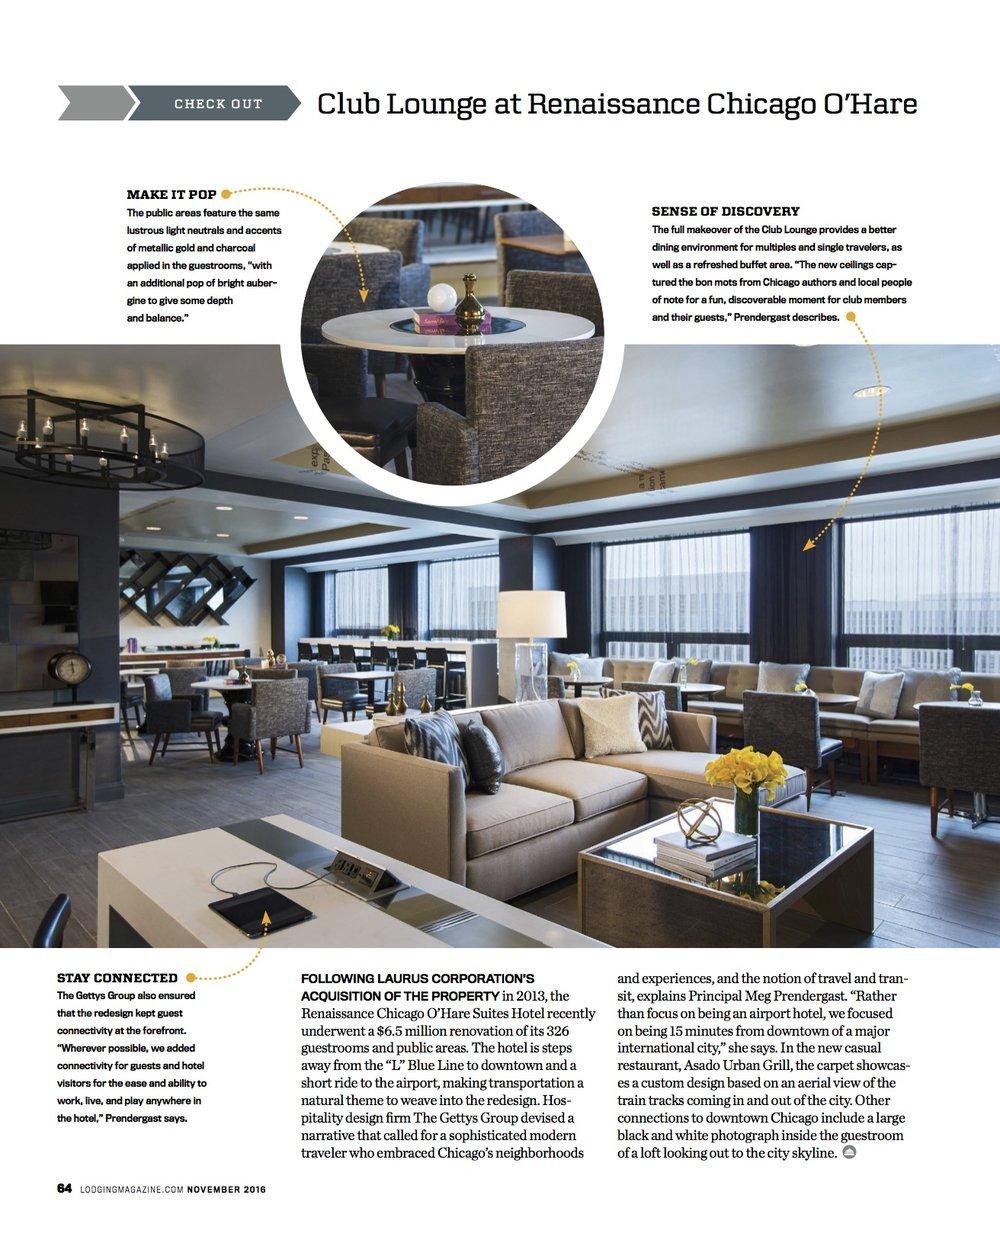 Lodging Magazine_November 2016.jpg